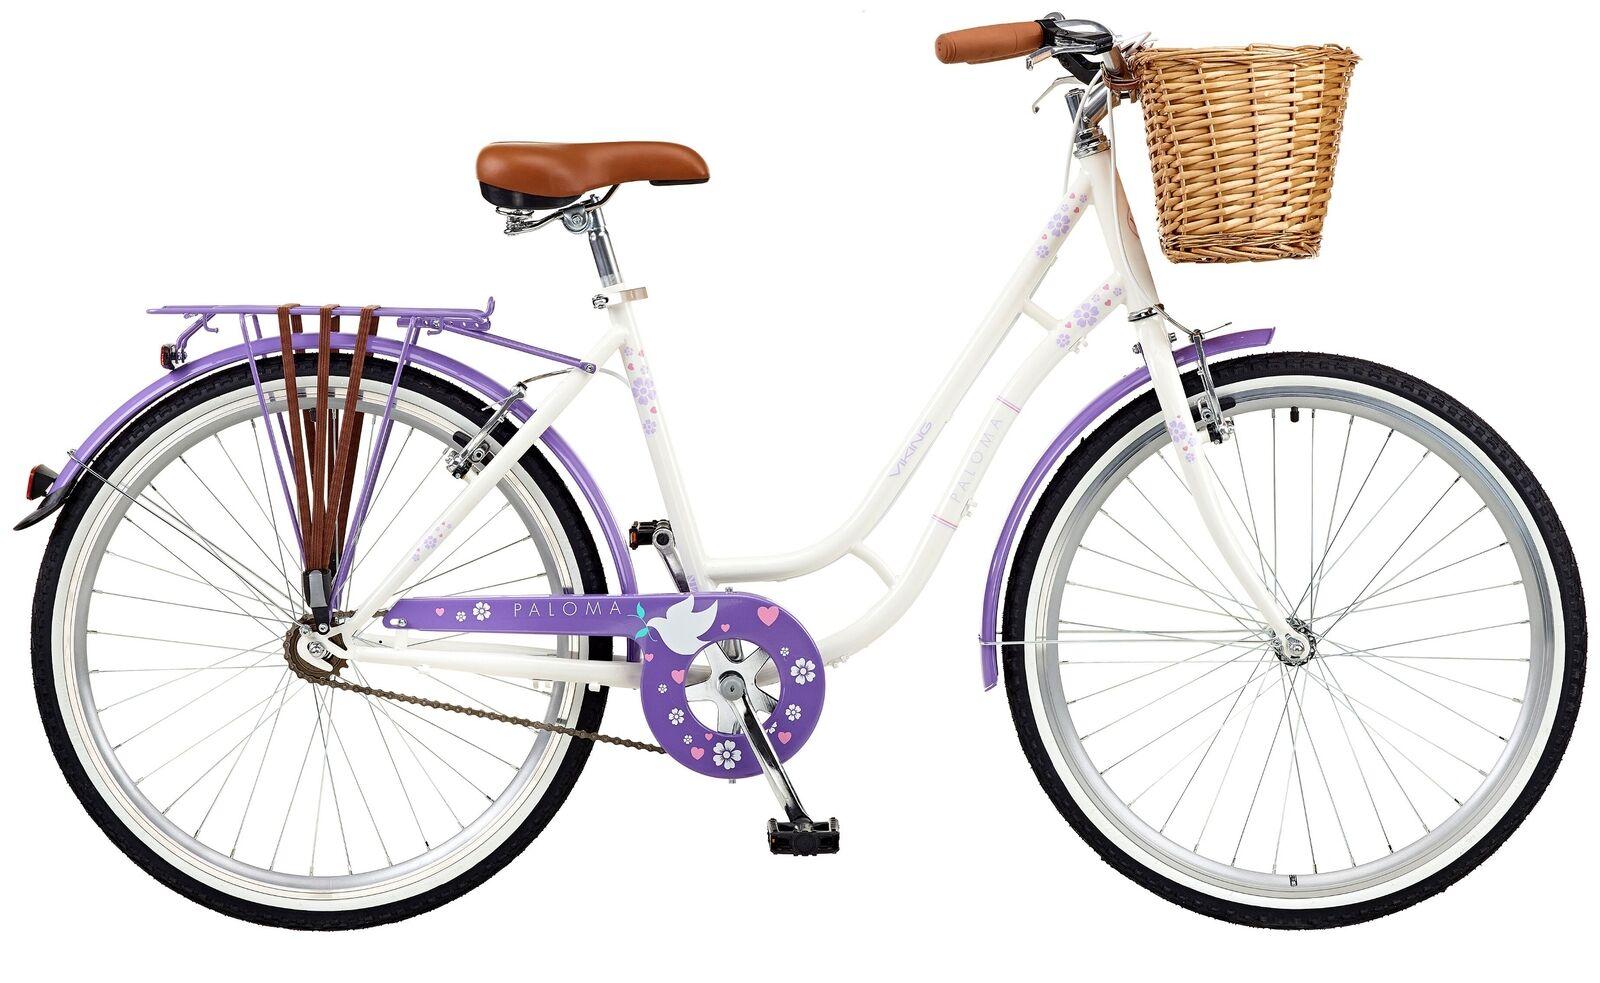 2018 Viking Paloma Mujer Bicicleta Holandesa Tradicional 26  Rueda Rueda Rueda e298f4